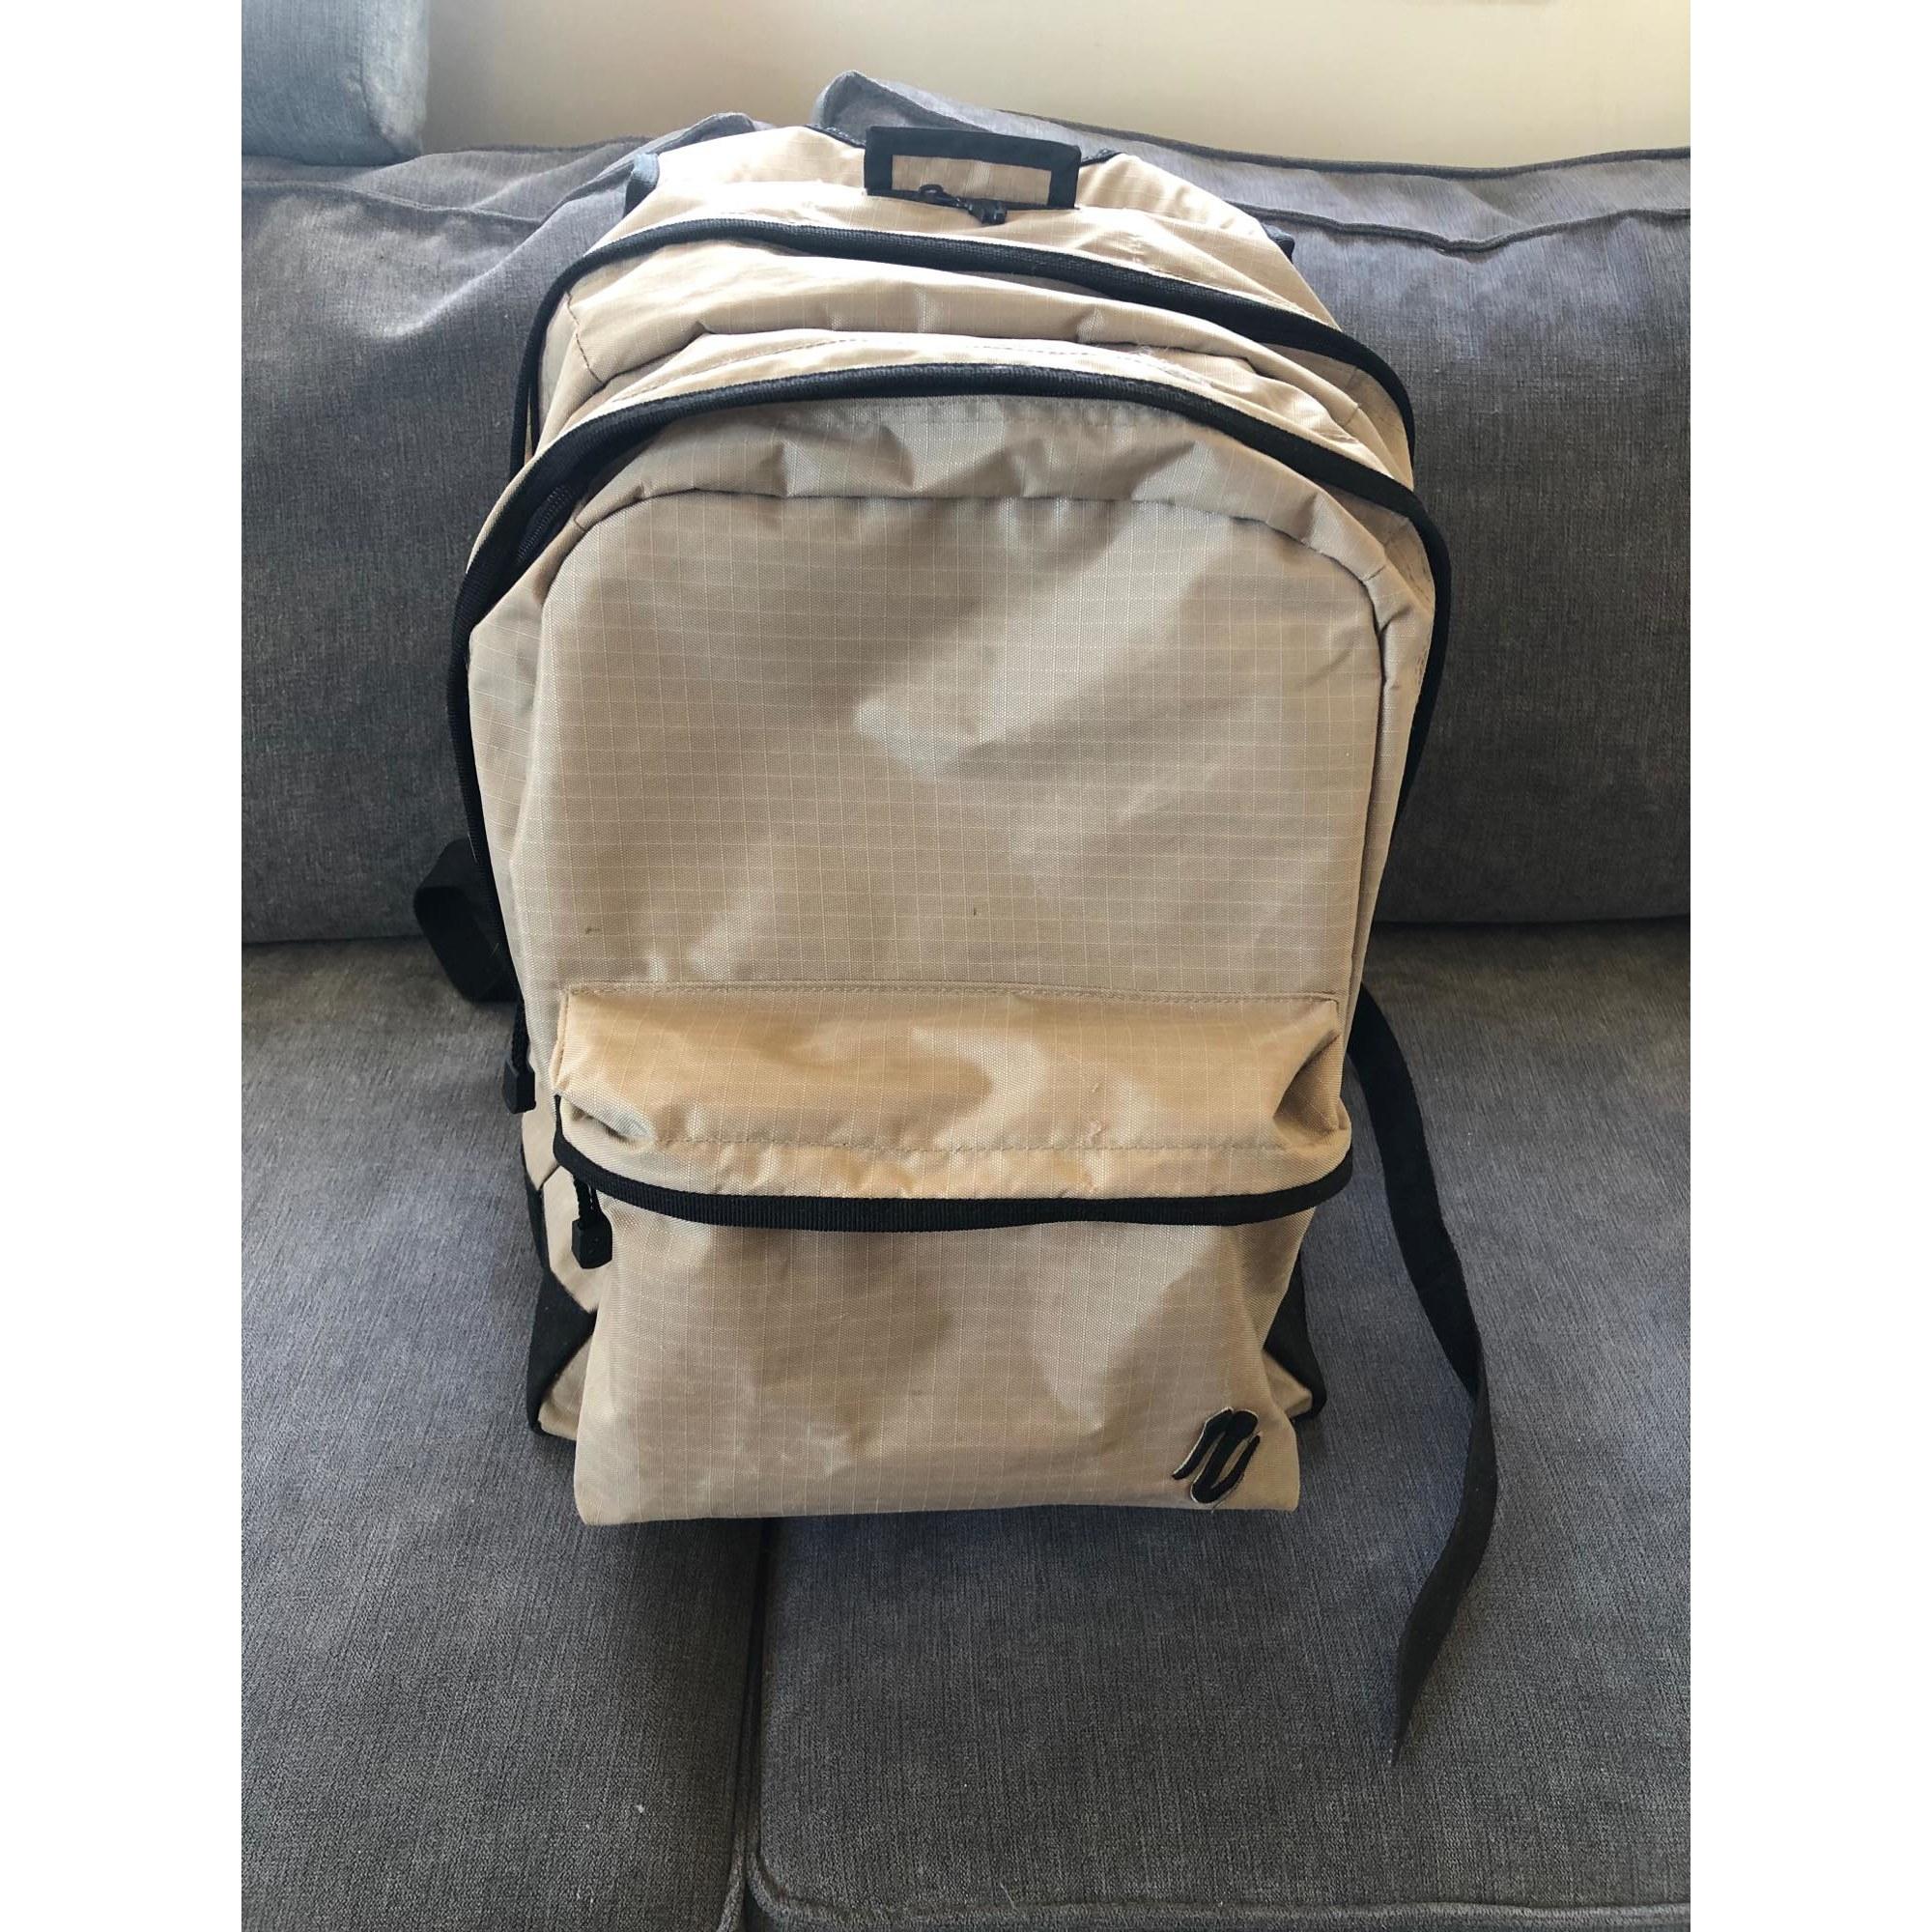 Backpack R-TOWN Beige, camel